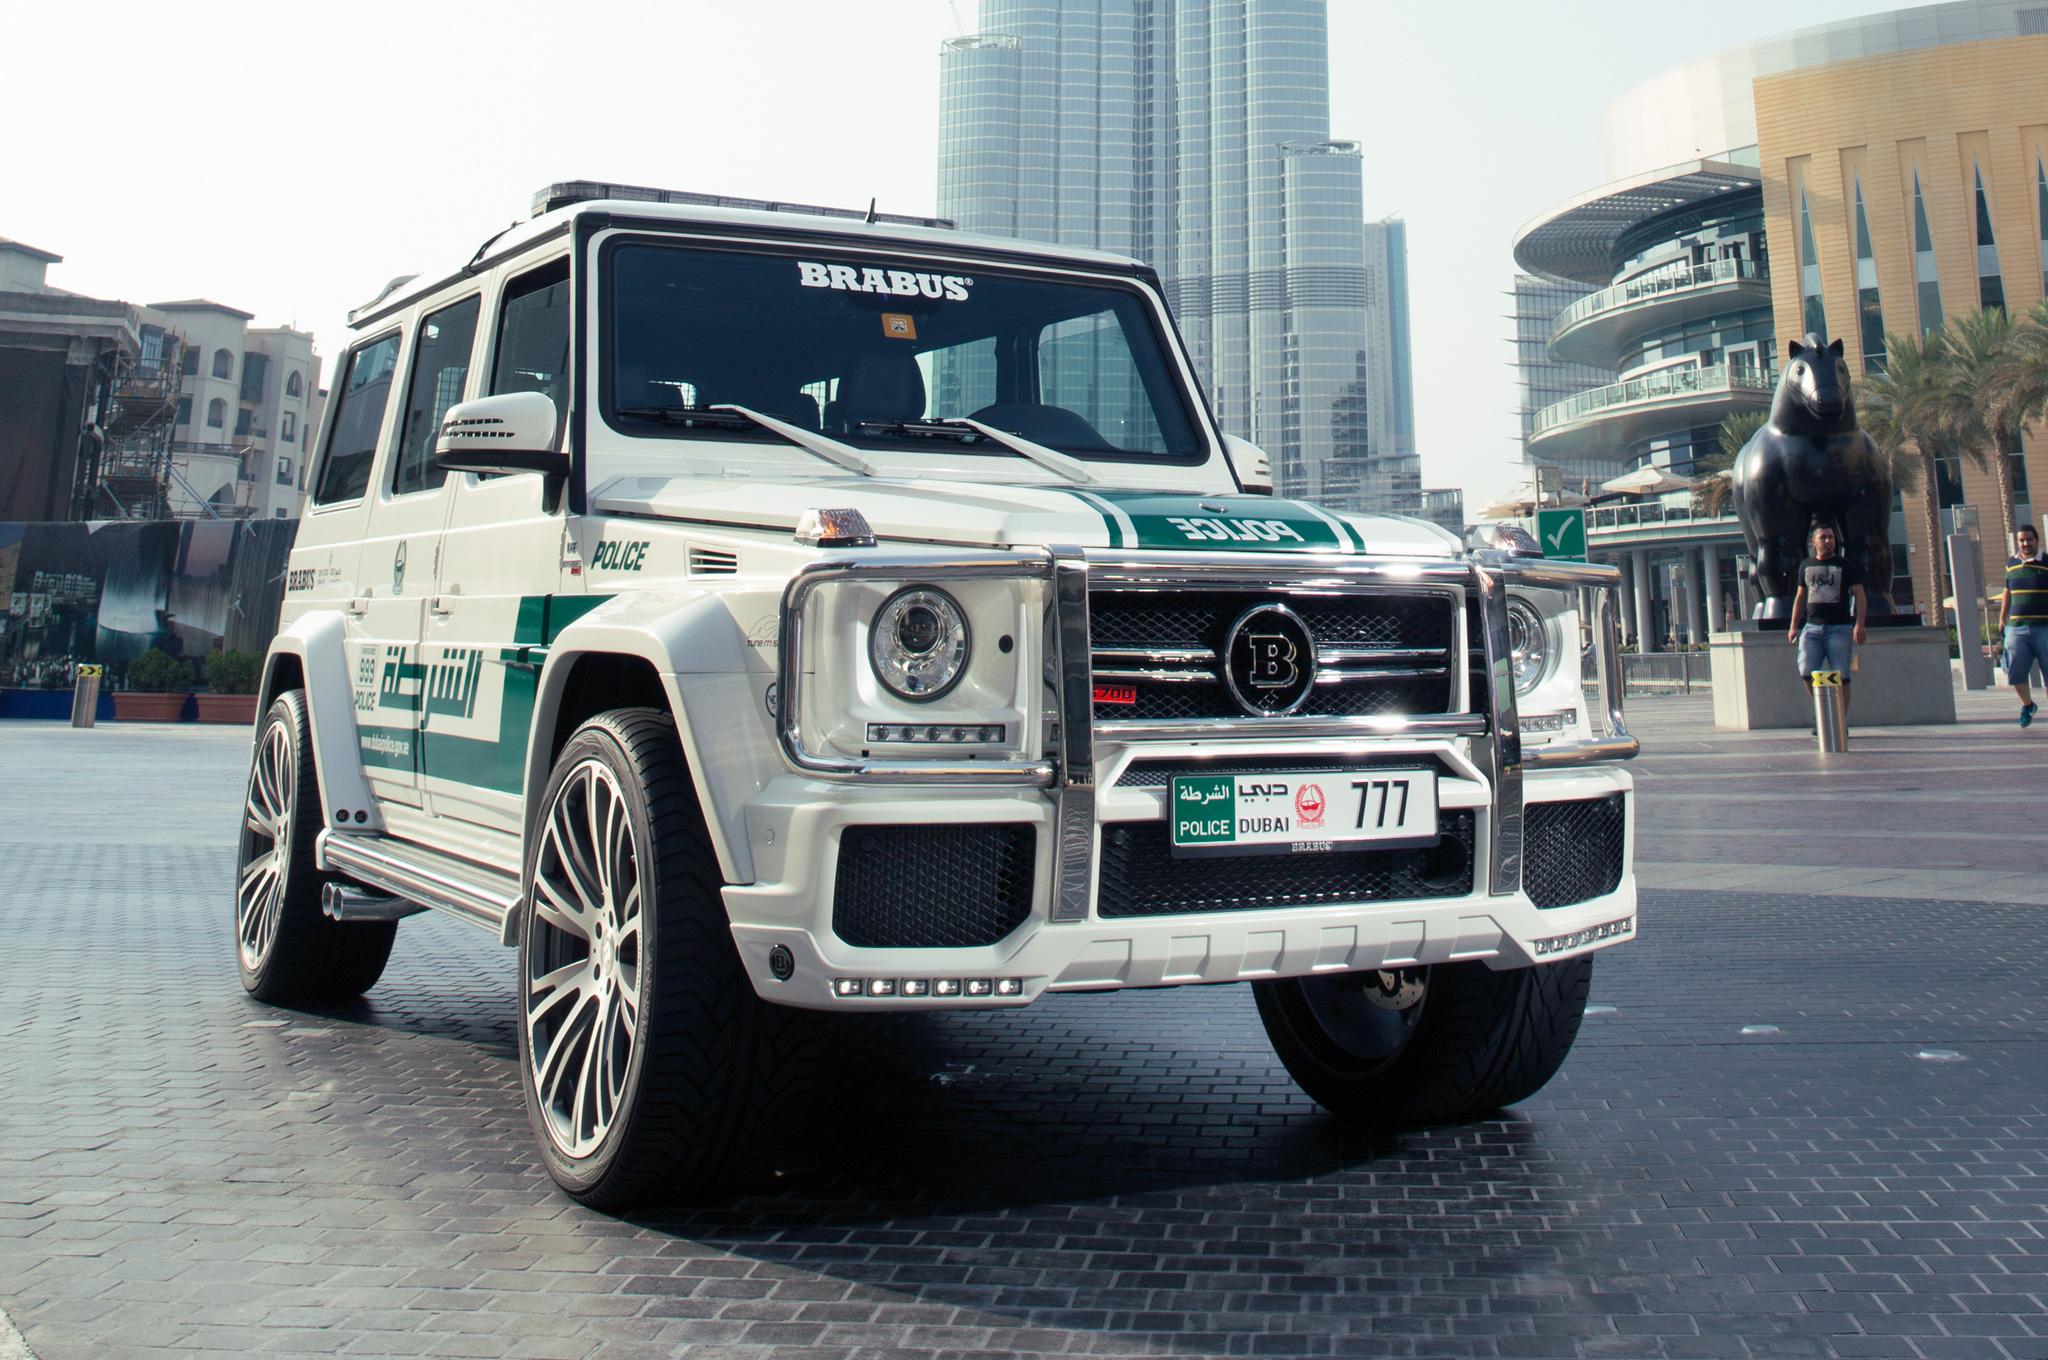 Resultado de imagen de autos lujosos policia Dubai